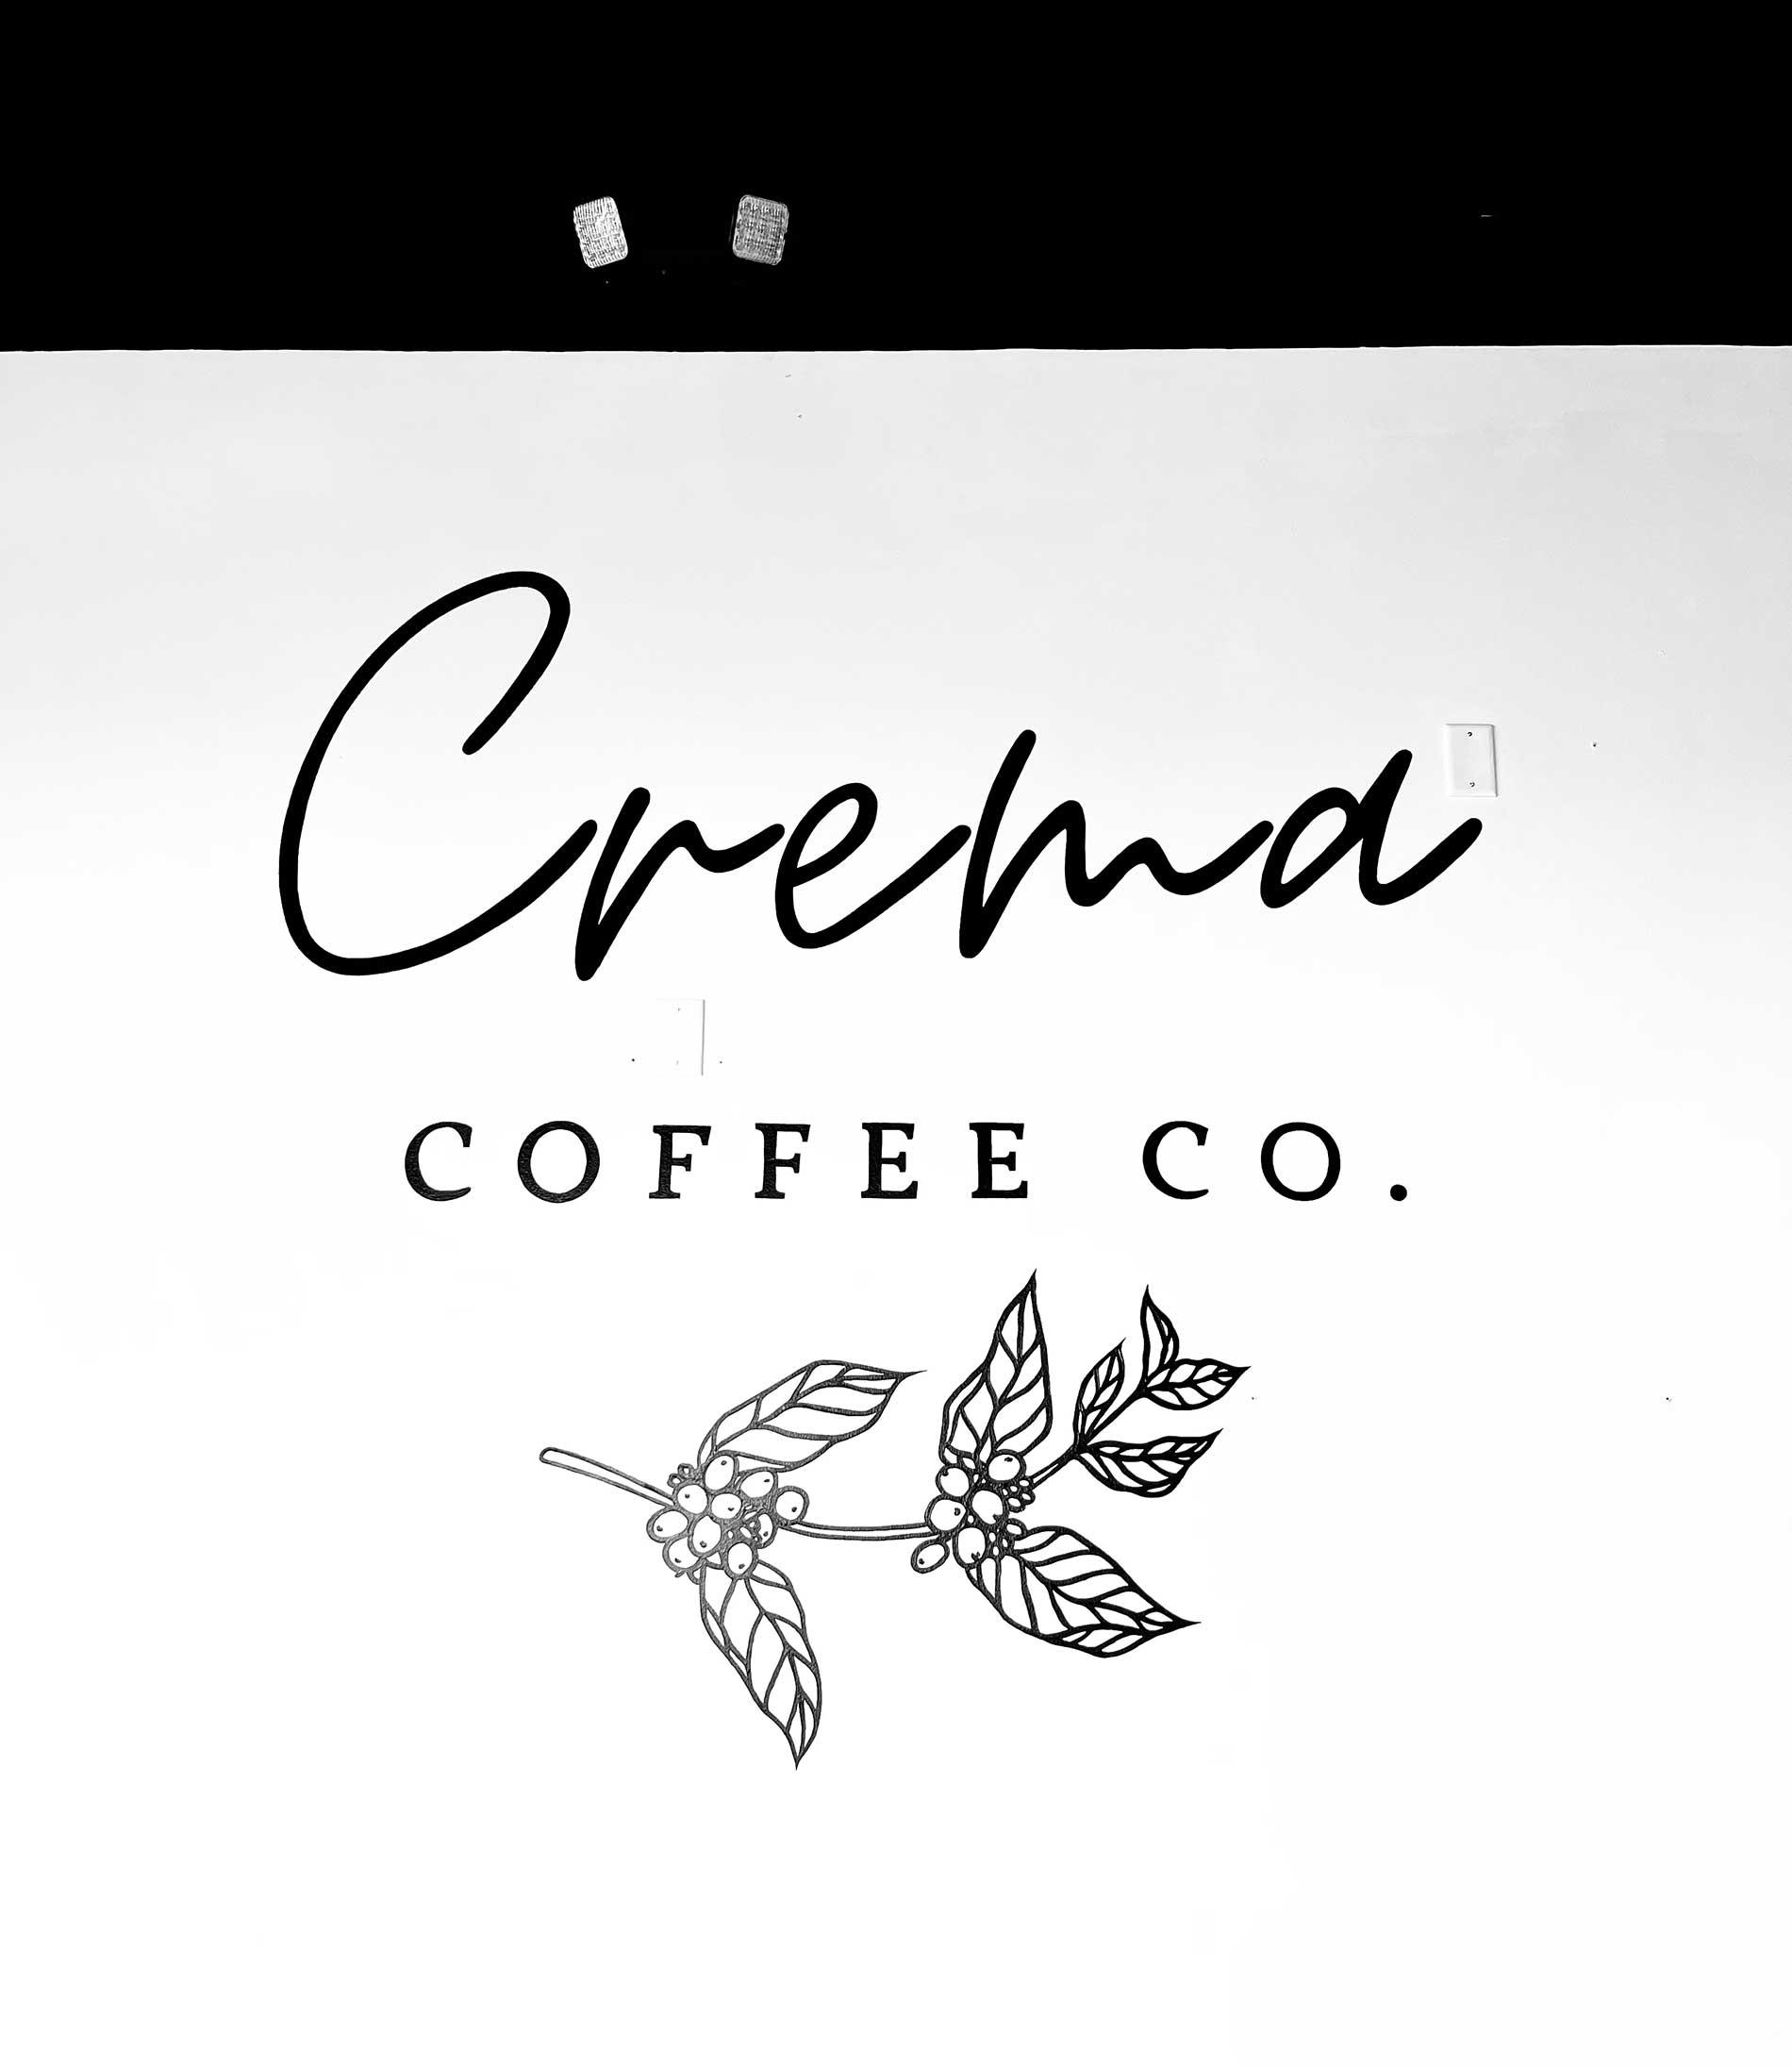 Crema coffee co - mural - logo painting - Dace Kidd - Mural Artist Tx